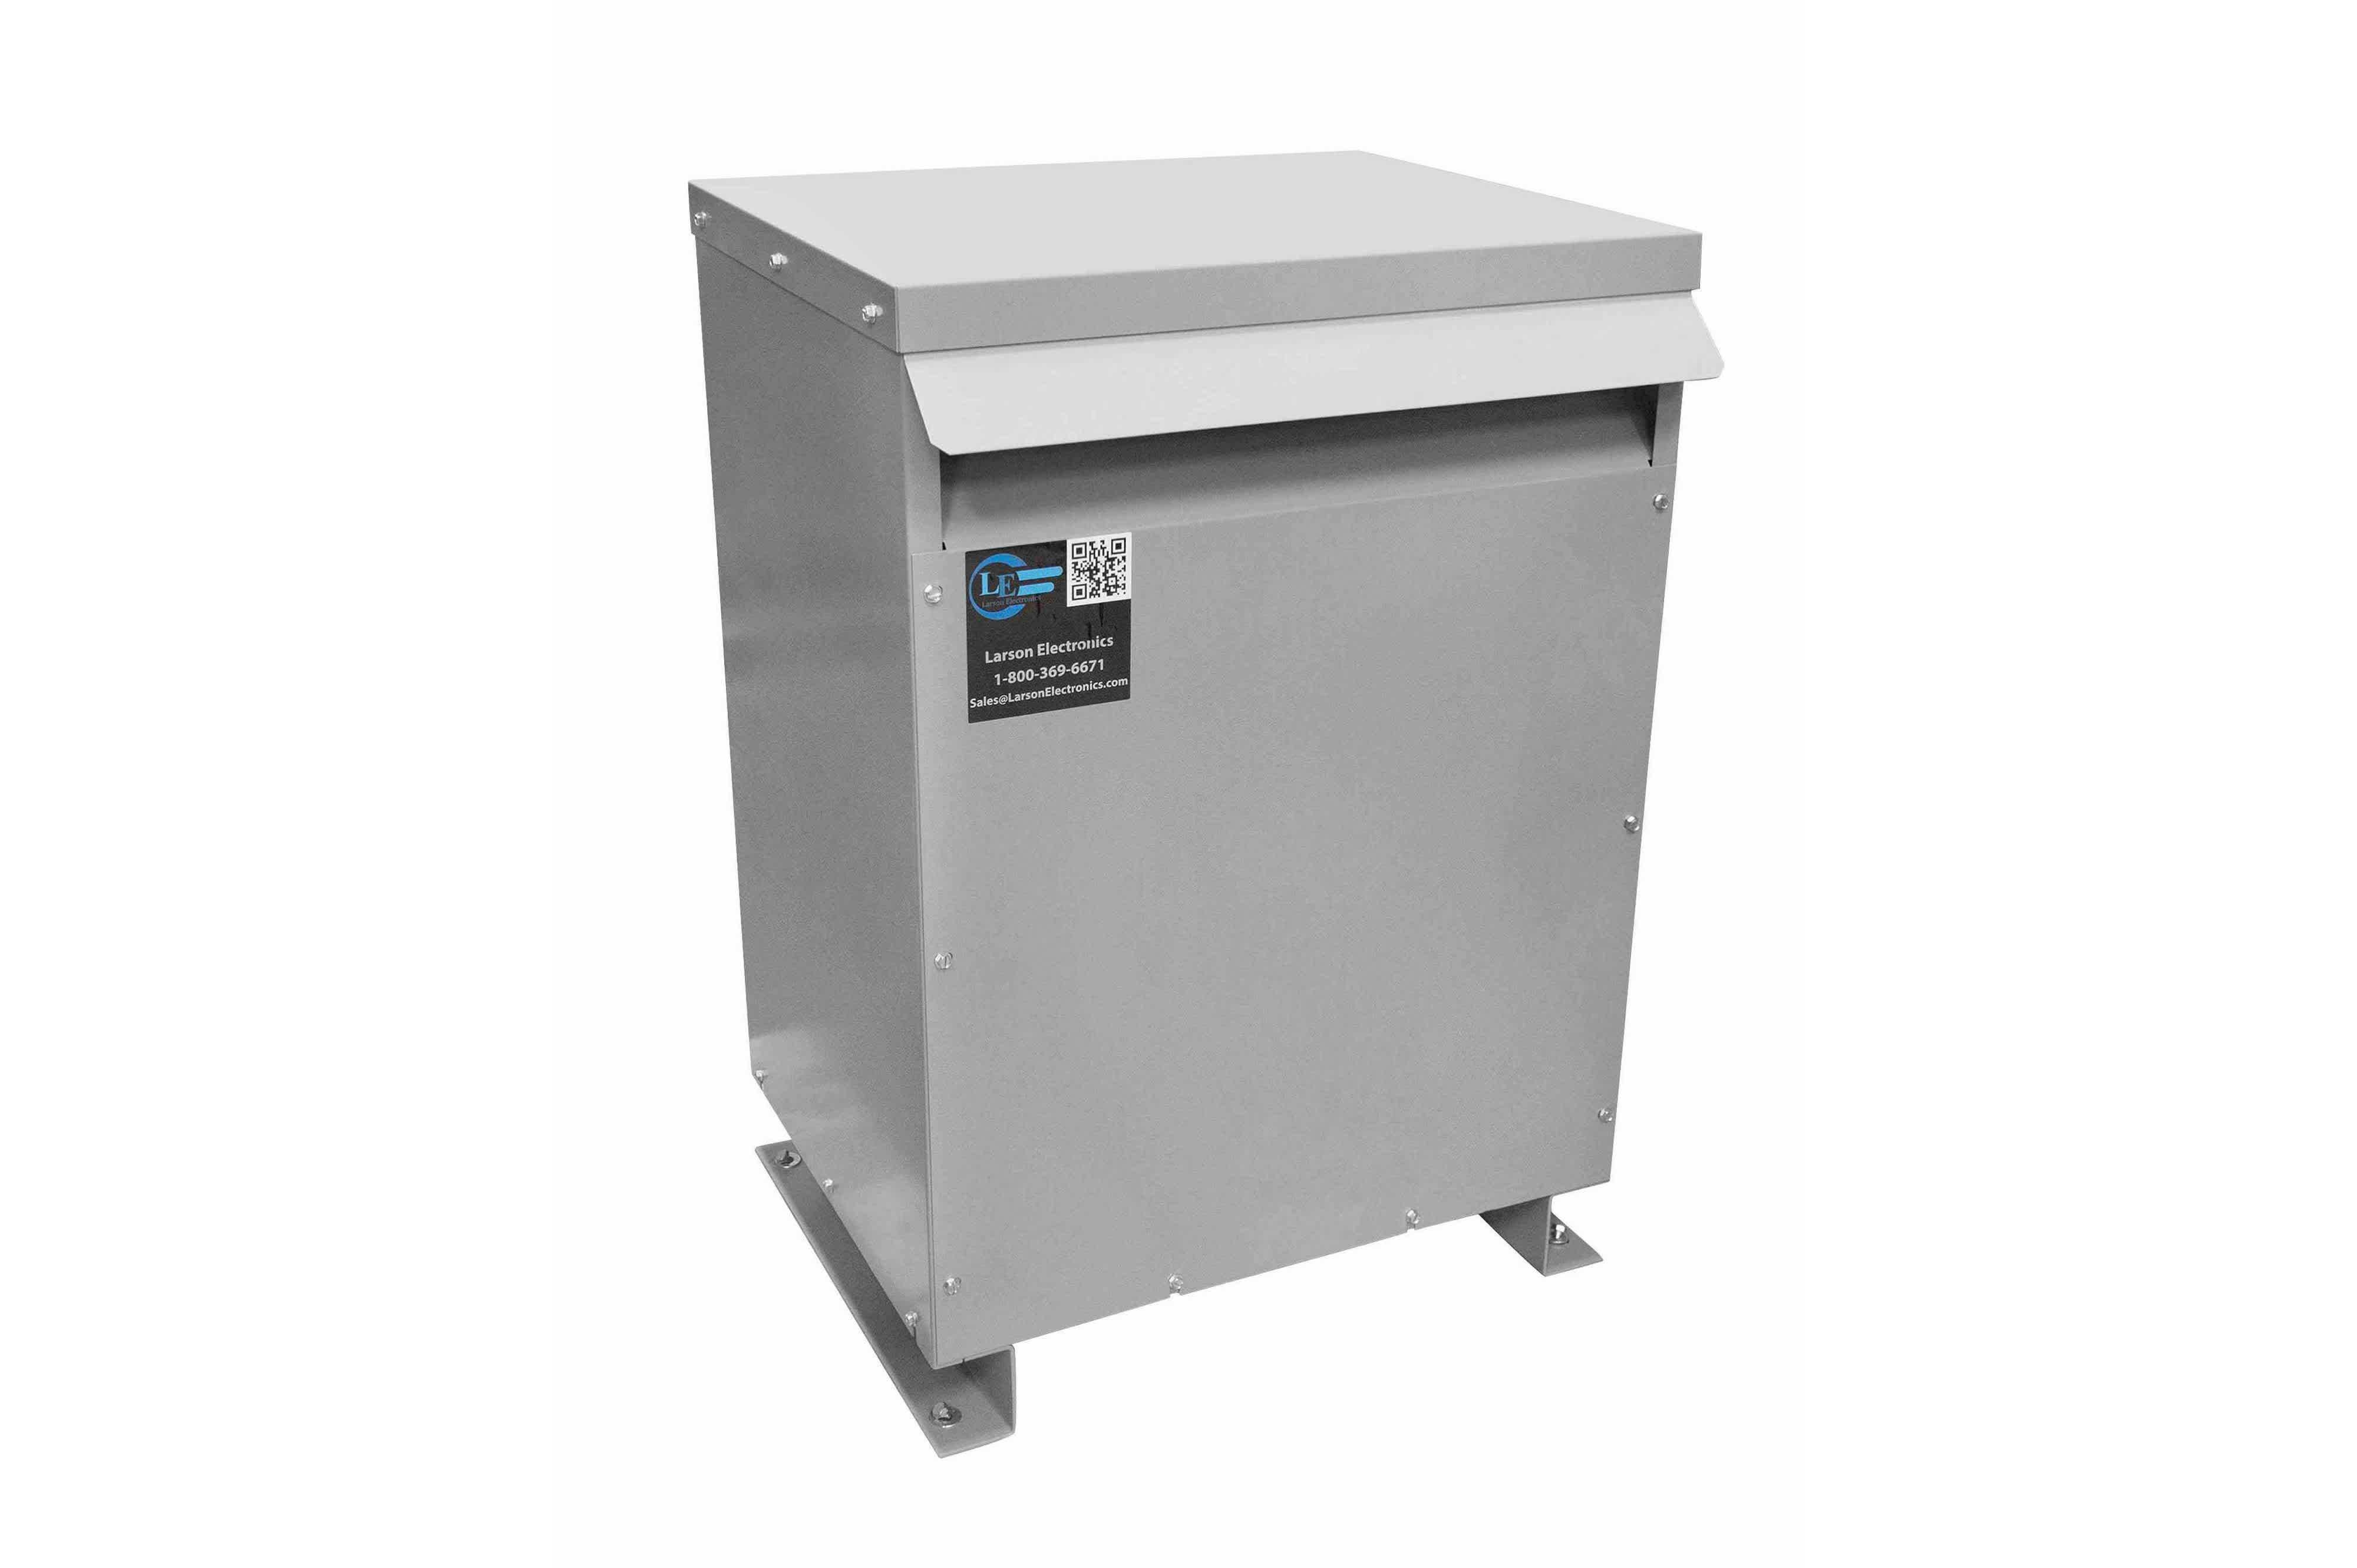 47.5 kVA 3PH Isolation Transformer, 415V Wye Primary, 240V/120 Delta Secondary, N3R, Ventilated, 60 Hz